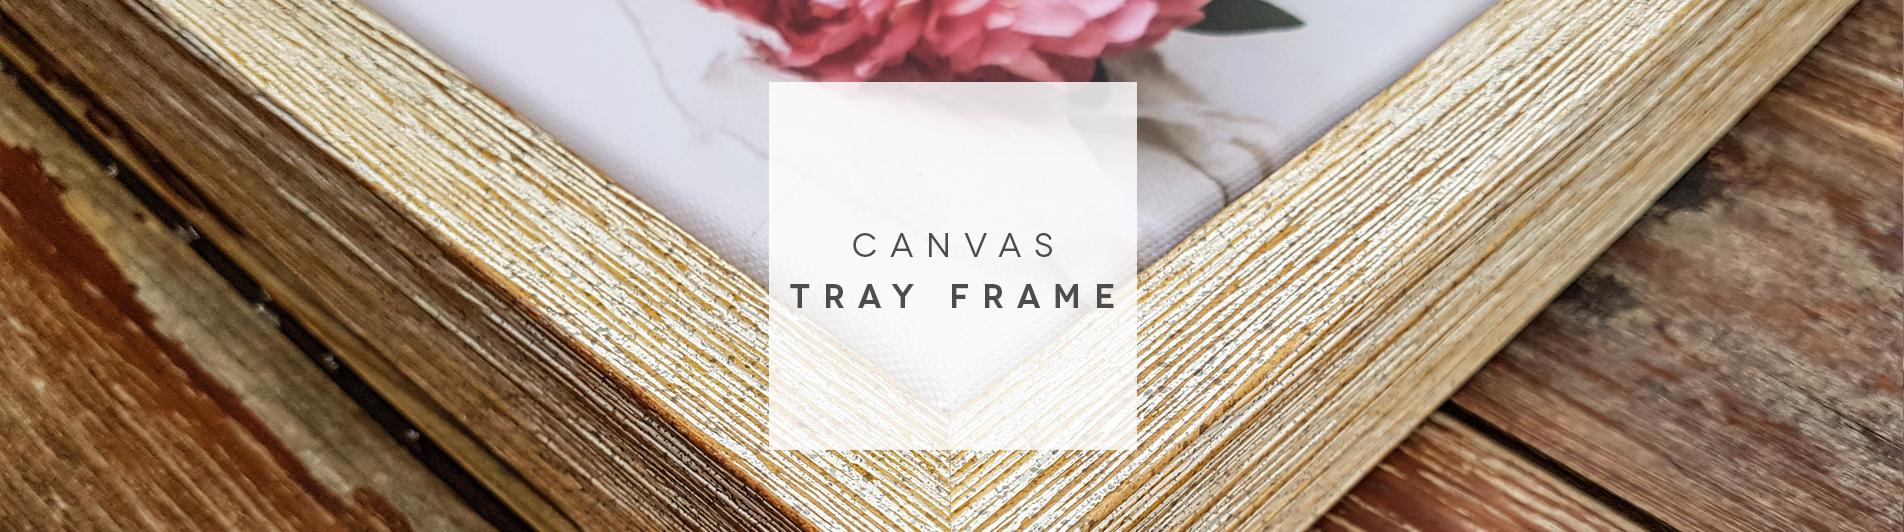 Canvas Tray Frame